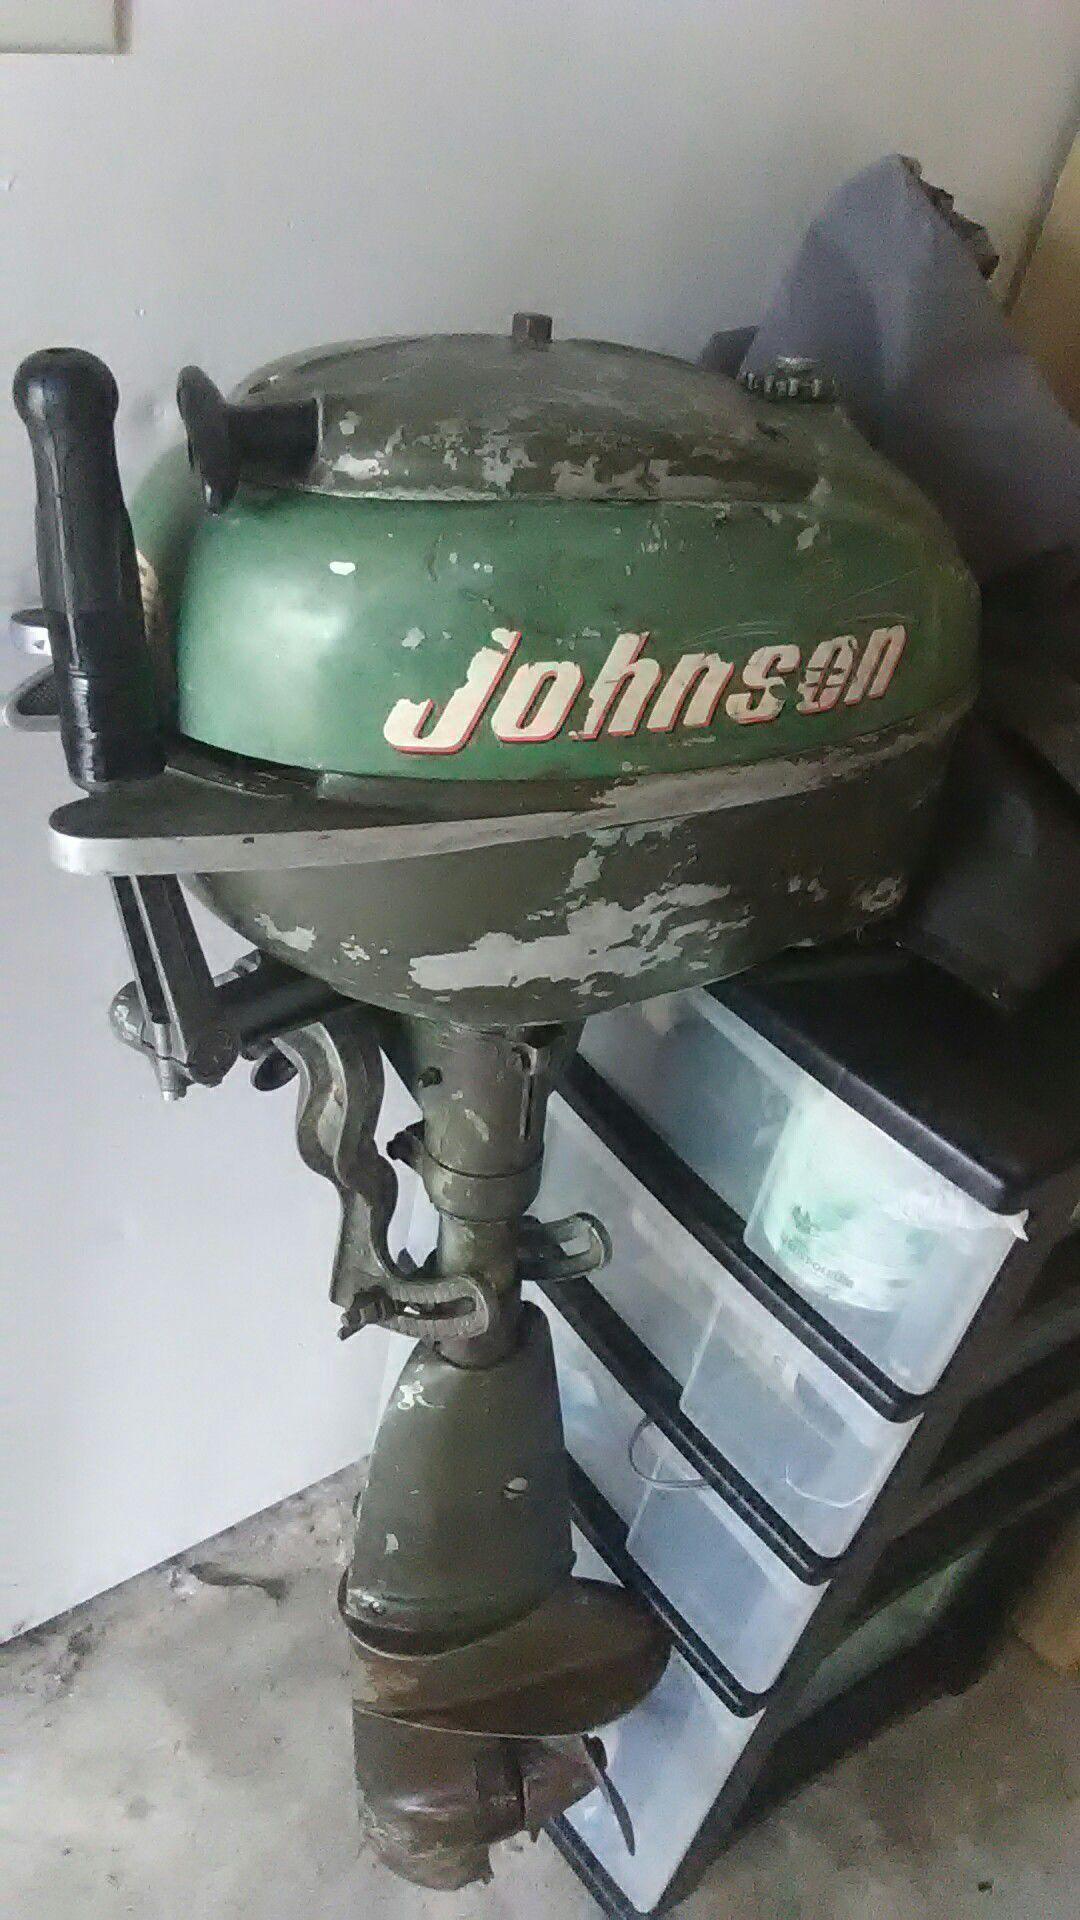 1964 Outbord Johnson Engine